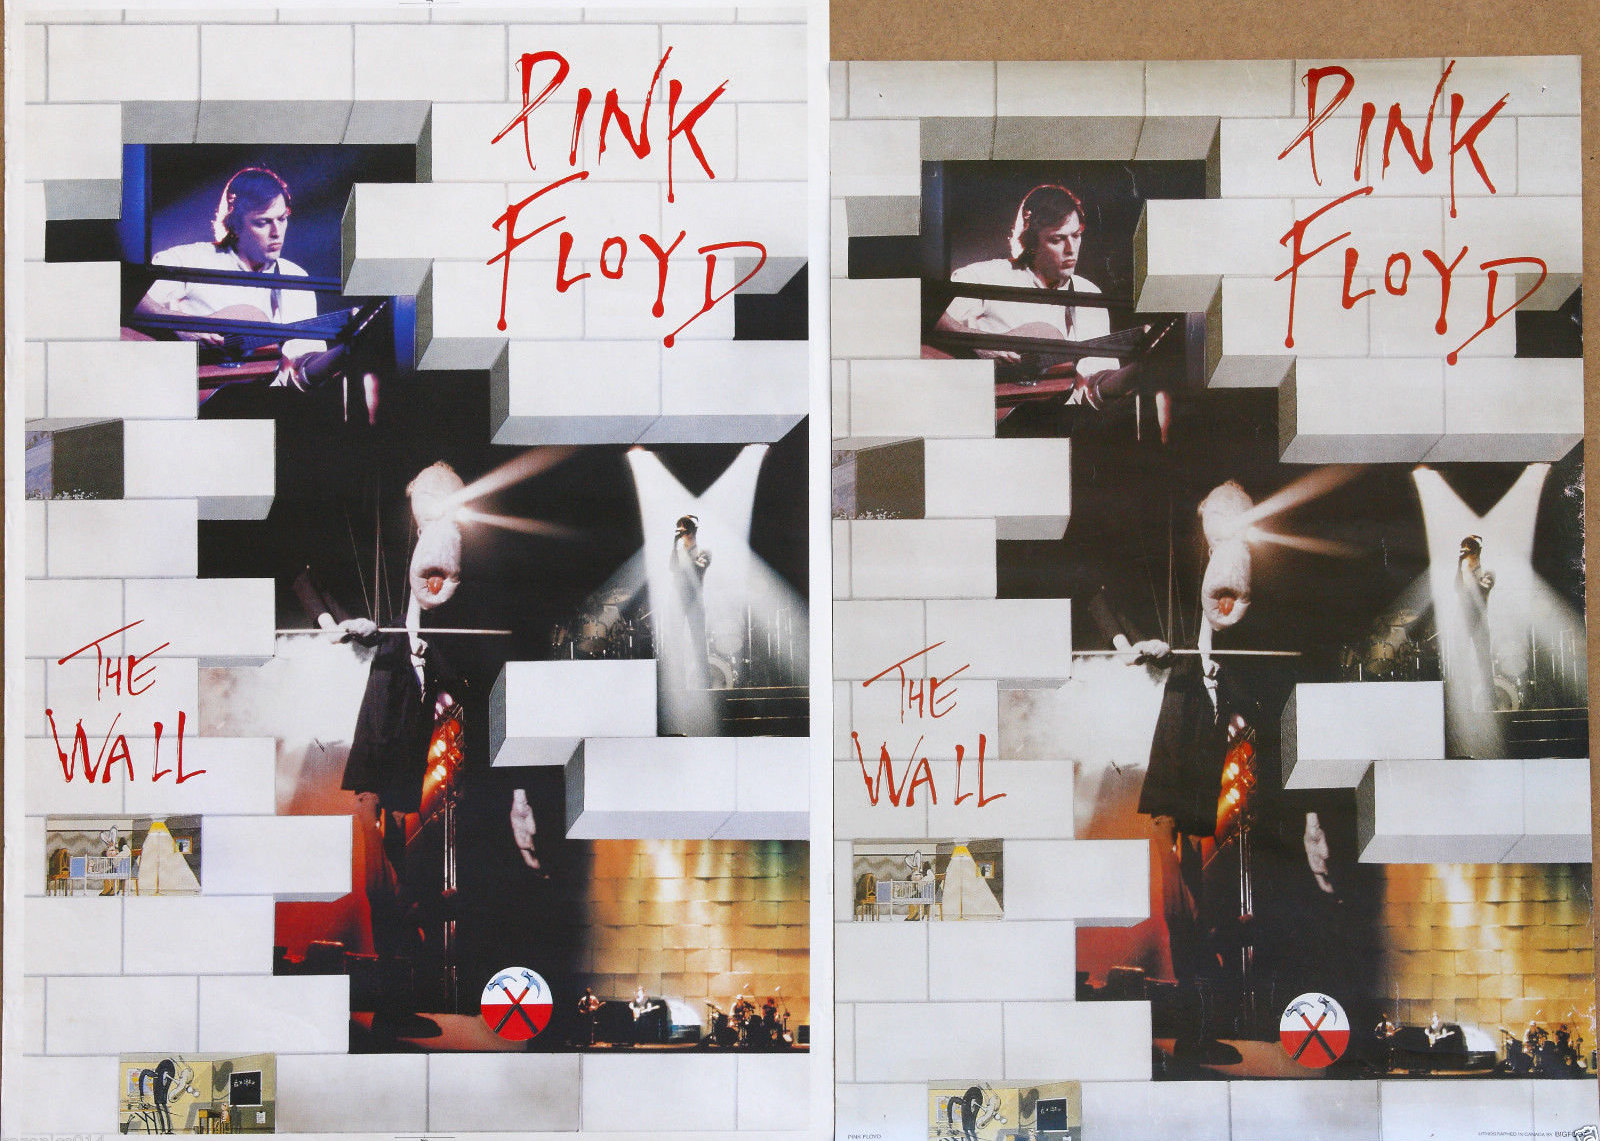 Pink Floyd Store : pink floyd the wall england uk import schwartz 1980 39 s vintage promo poster 34x24 not bigfoot ~ Russianpoet.info Haus und Dekorationen